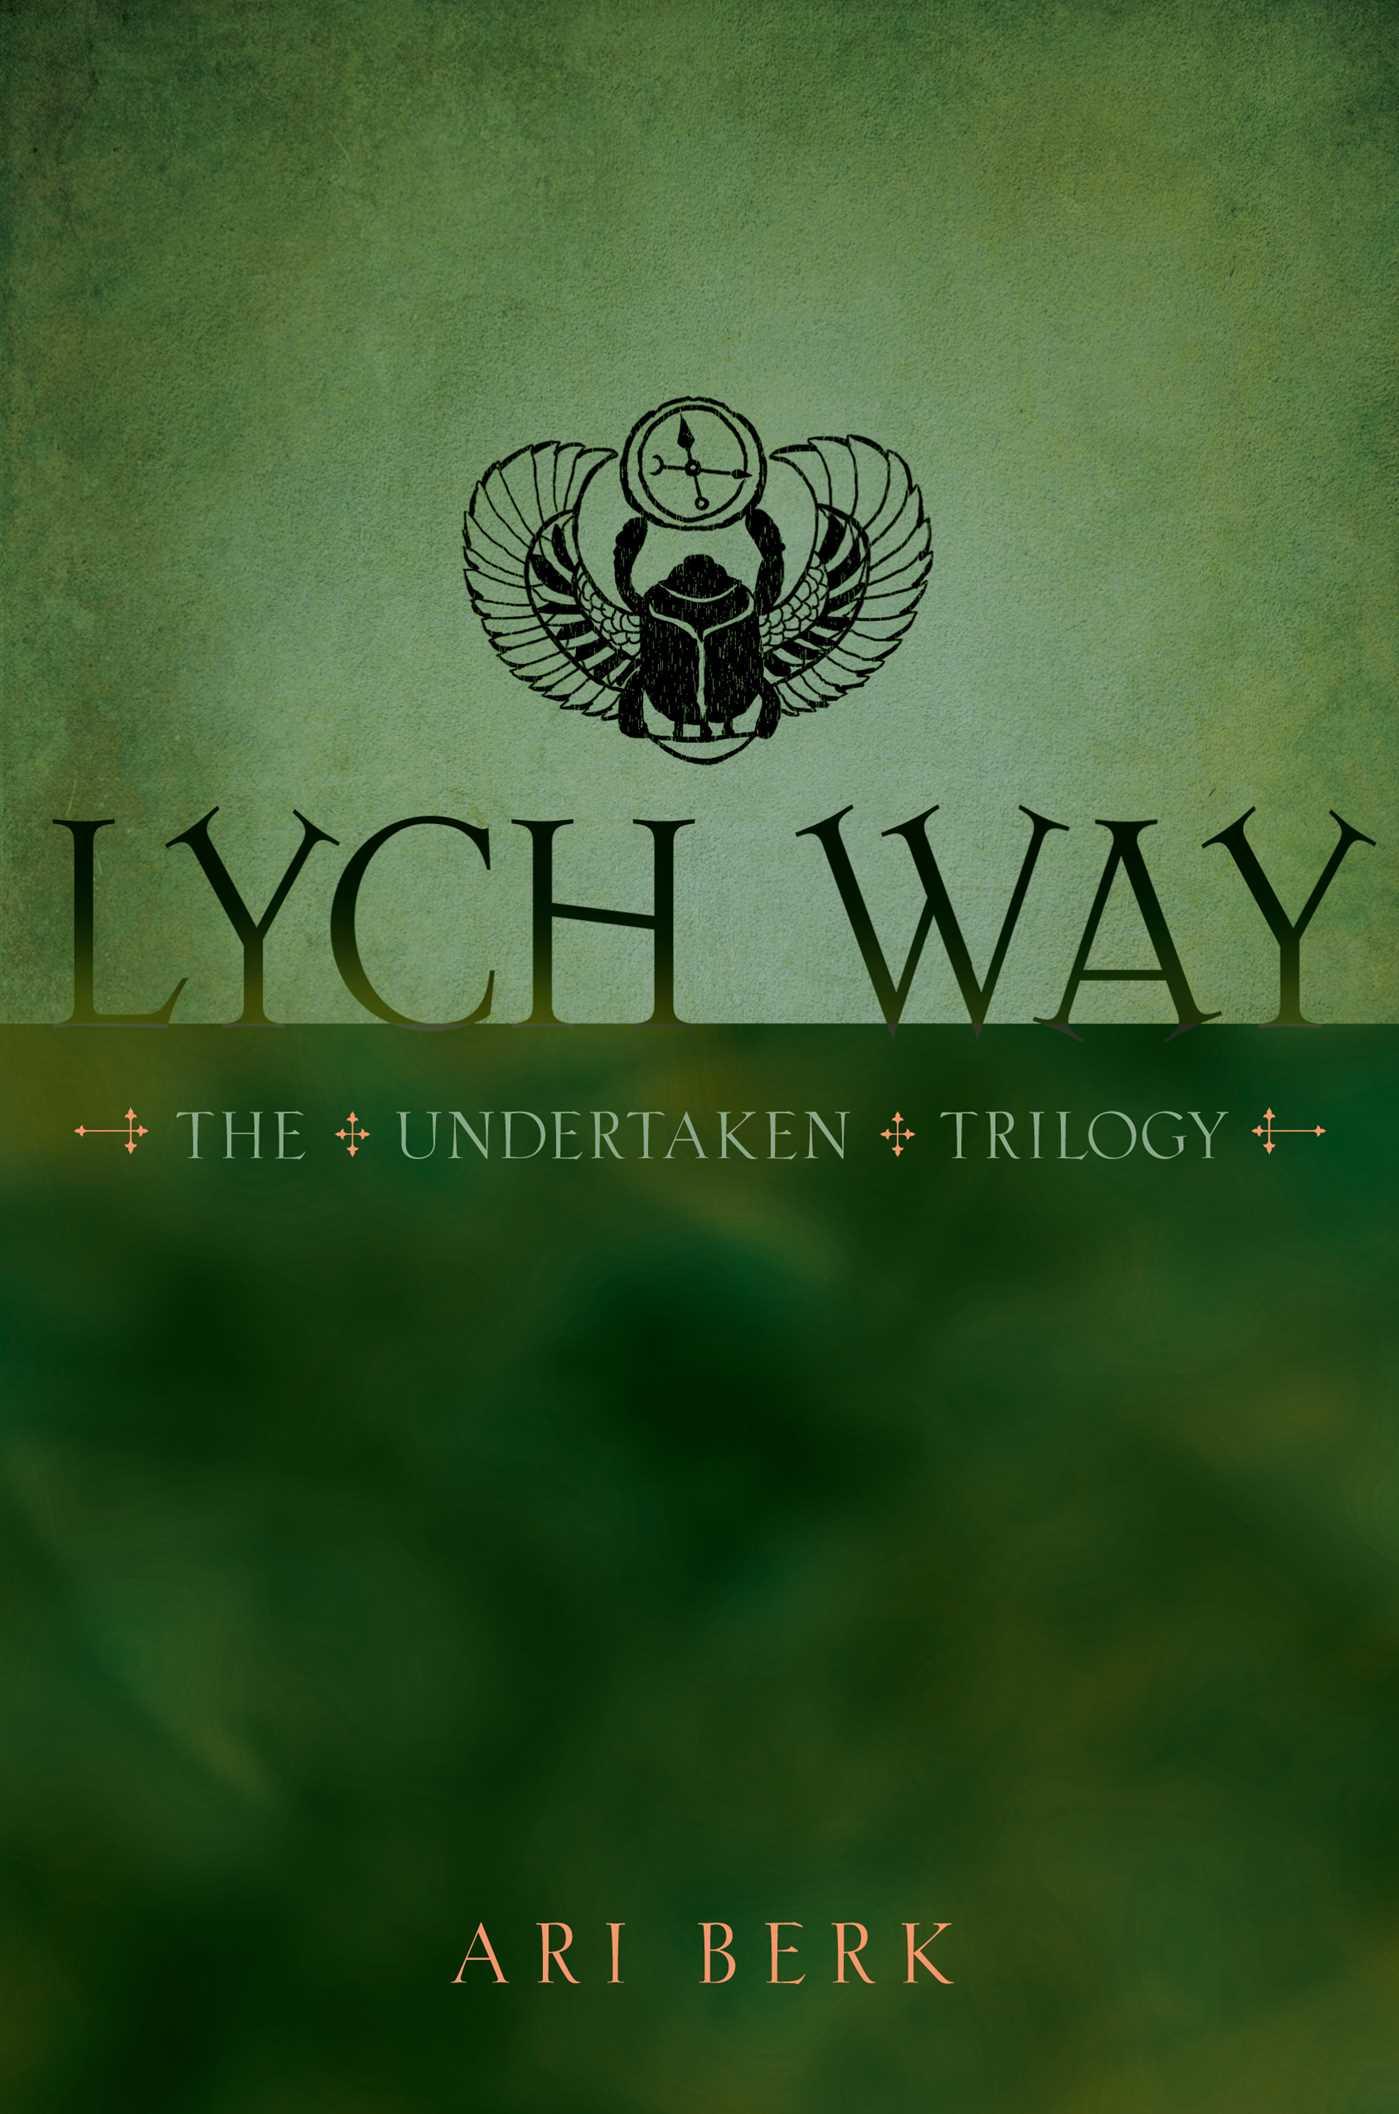 Lych way 9781416991205 hr